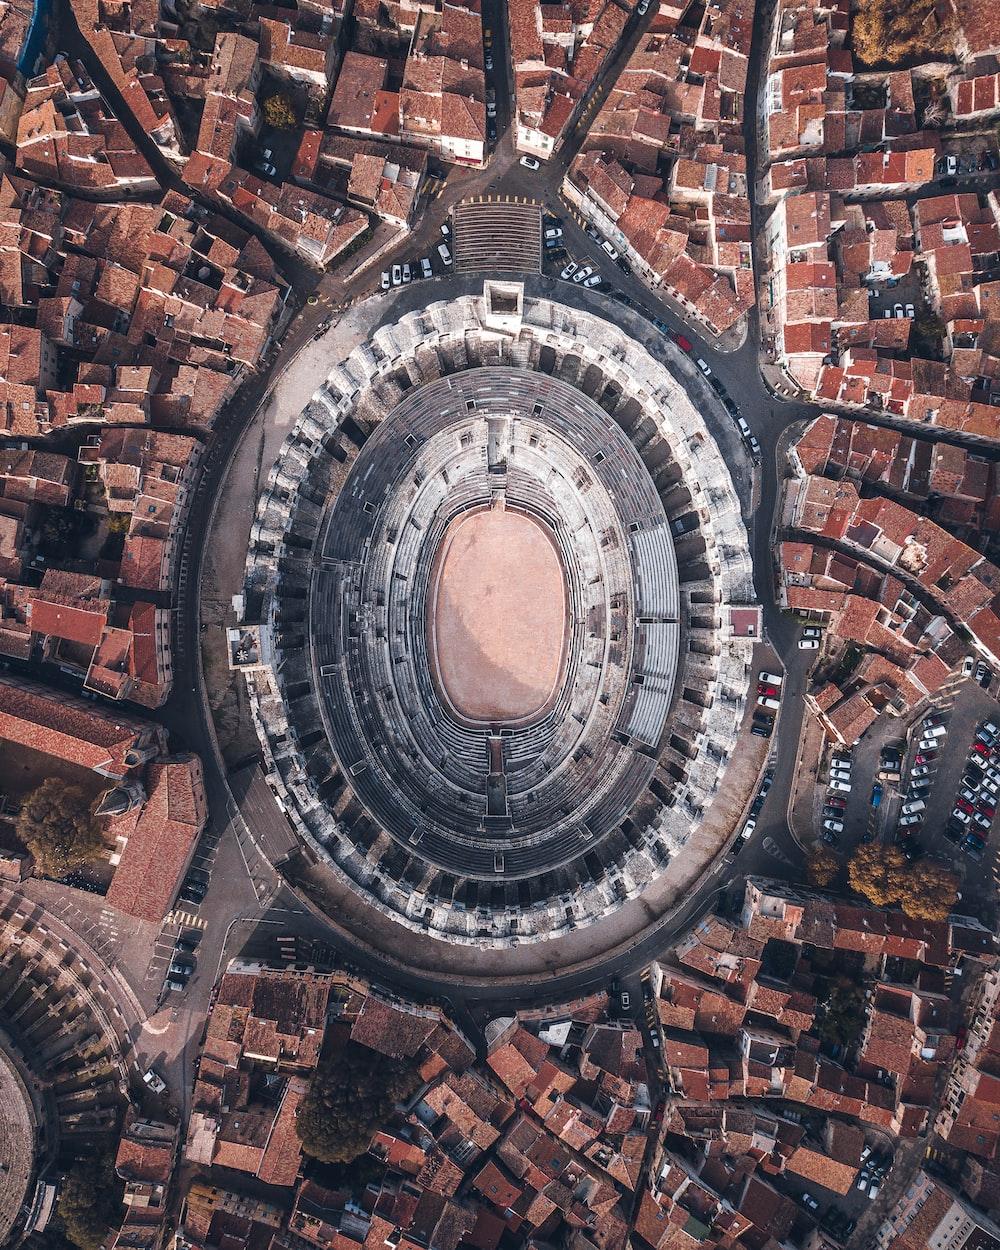 aerial view of stadium during daytime